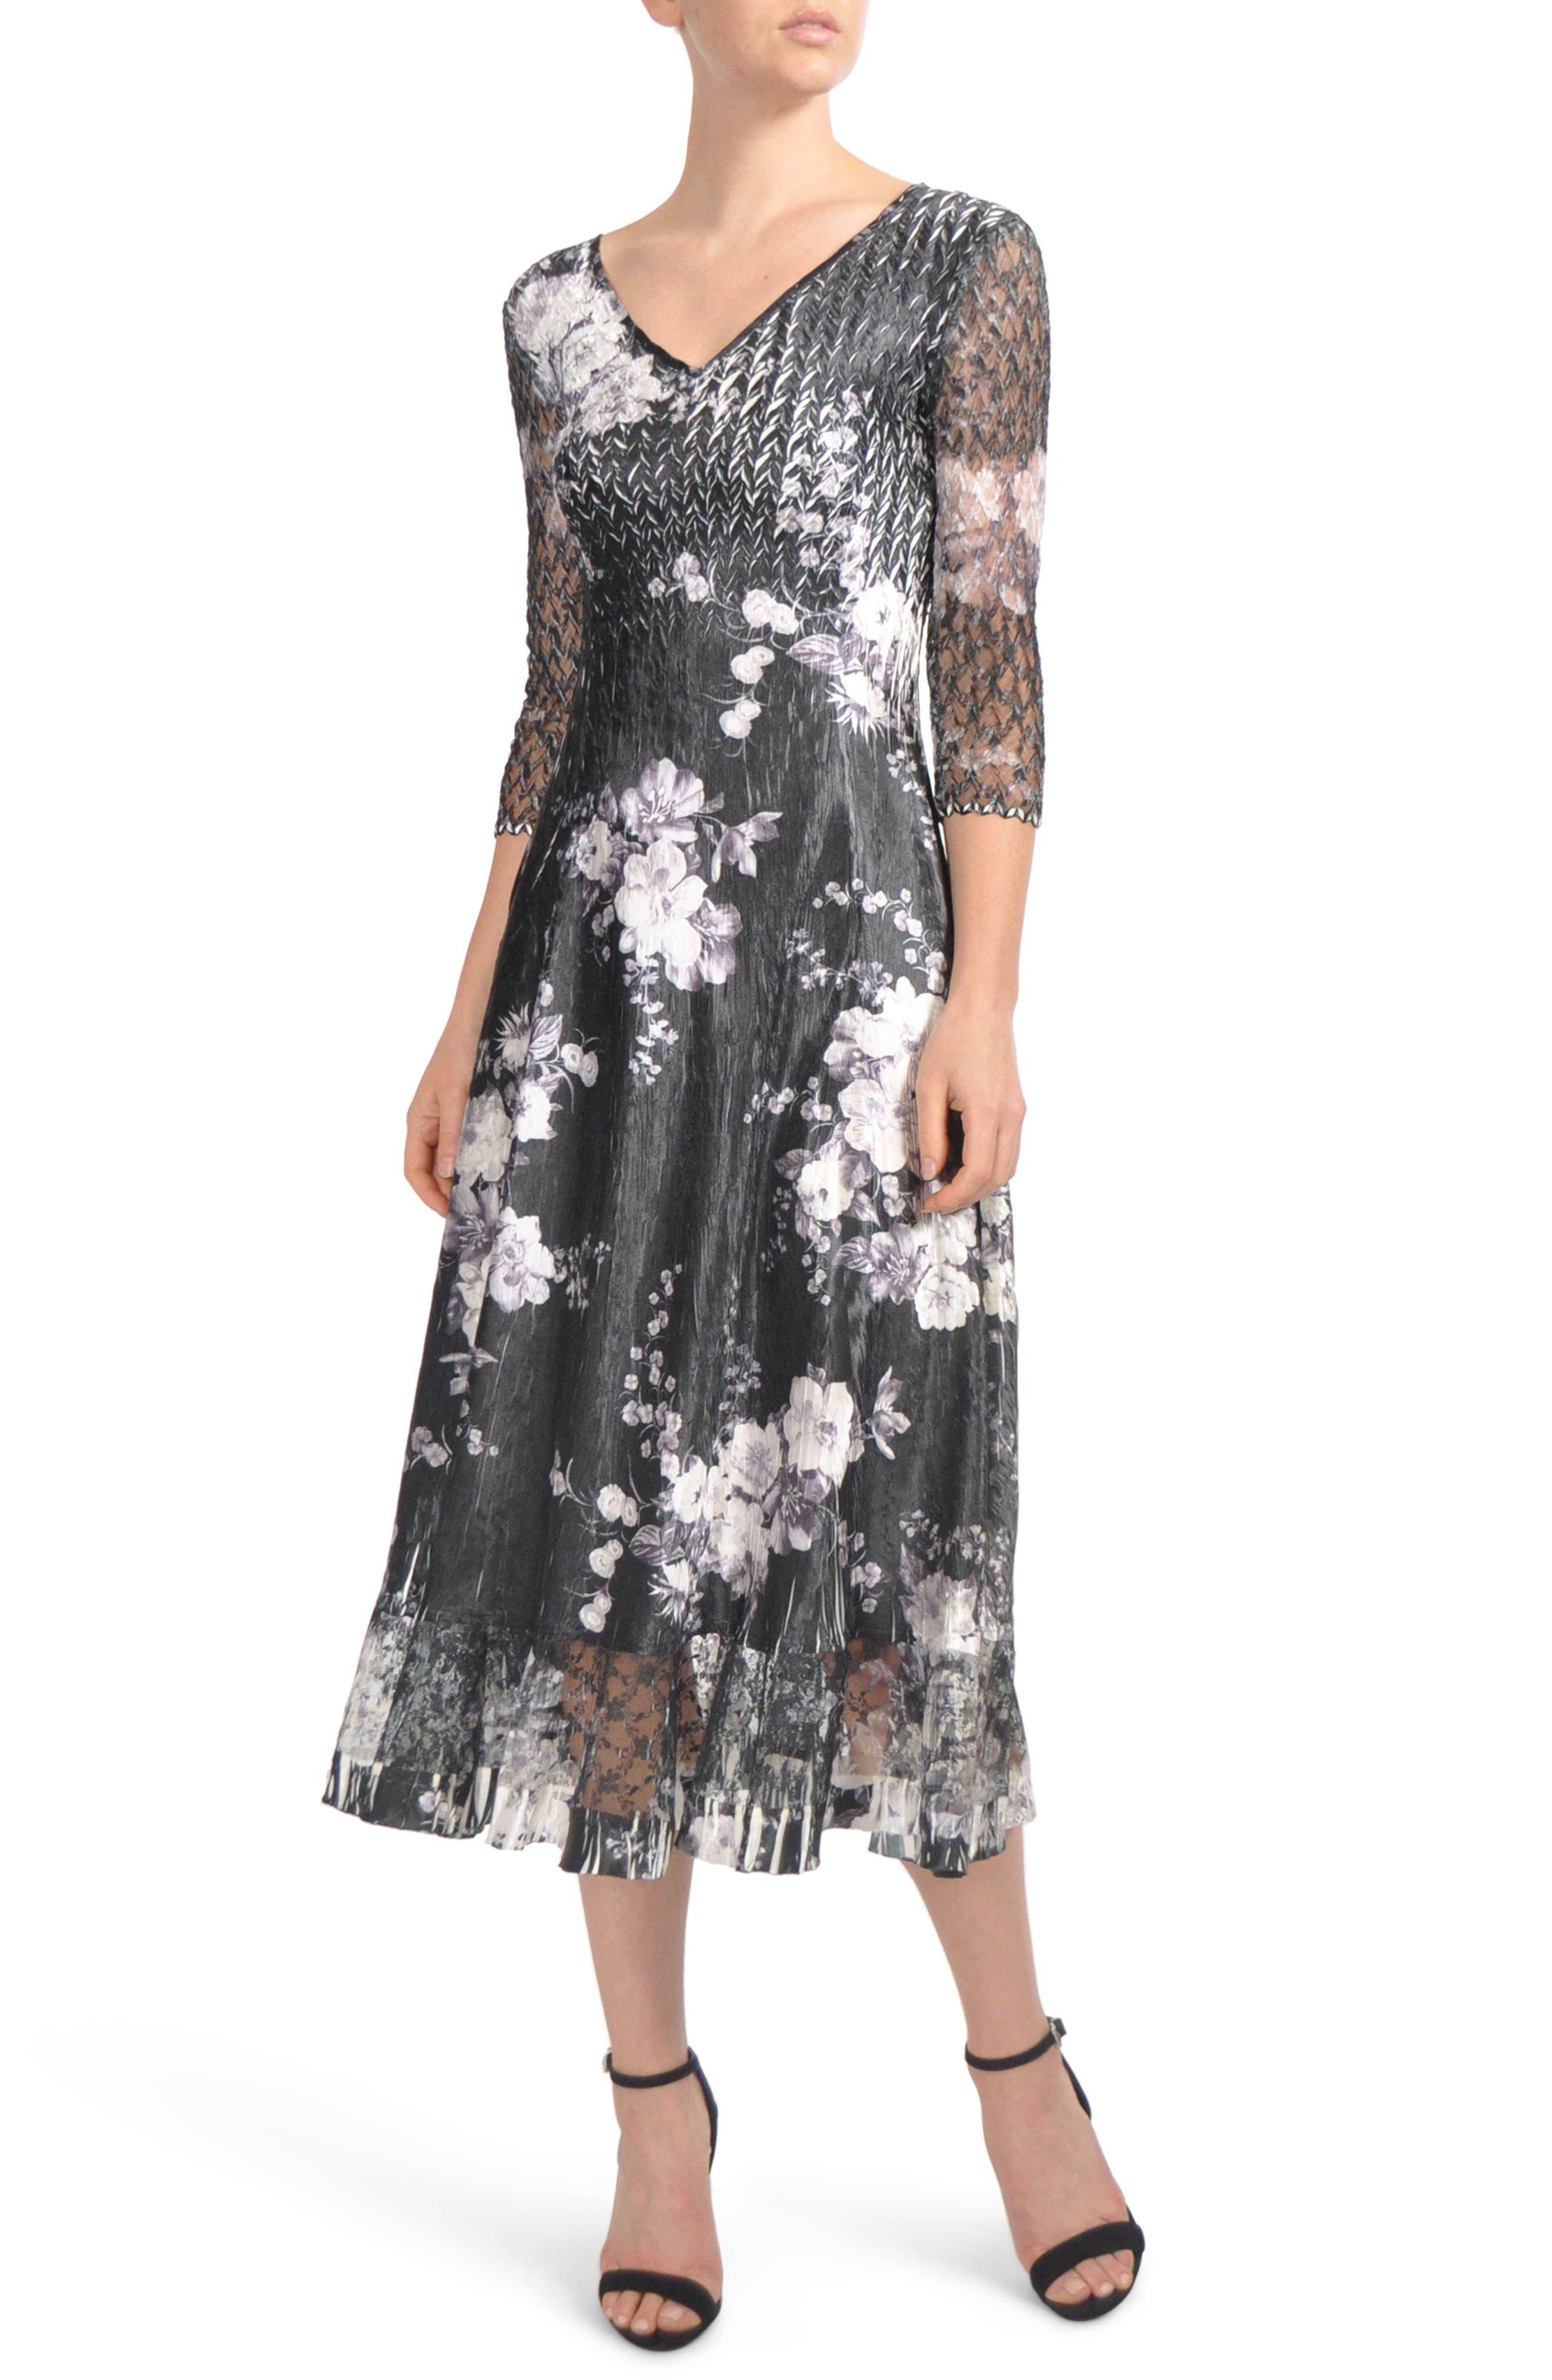 Floral Charmeuse & Lace Tea Length Dress,                             Main thumbnail 1, color,                             Eclipse Meadow